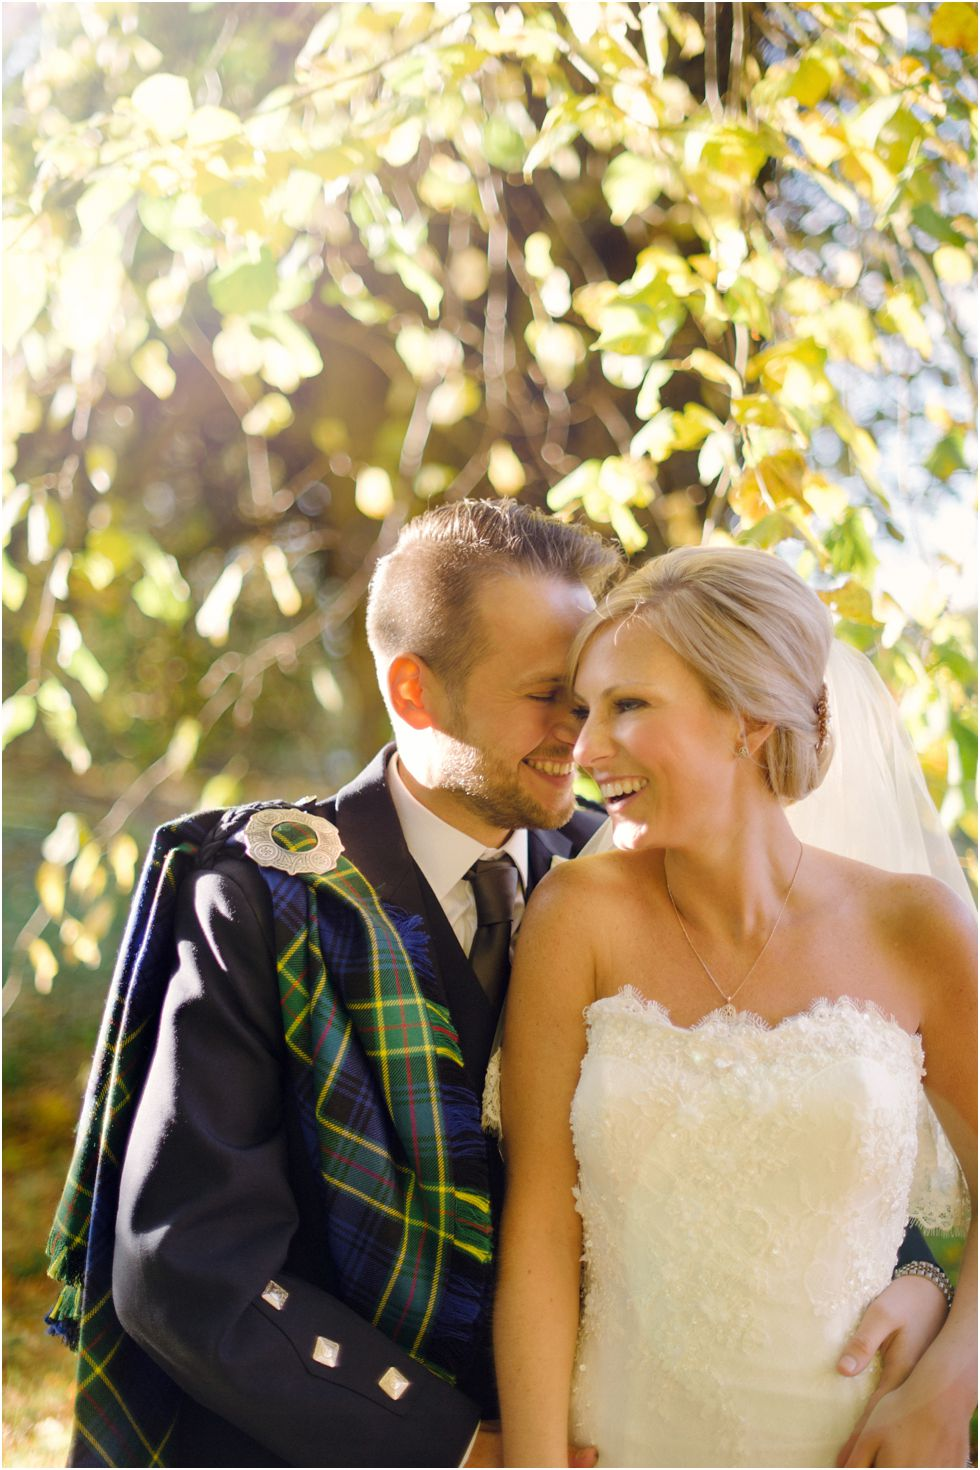 Hopetoun-House-wedding-photography-Edinburgh-56.jpg